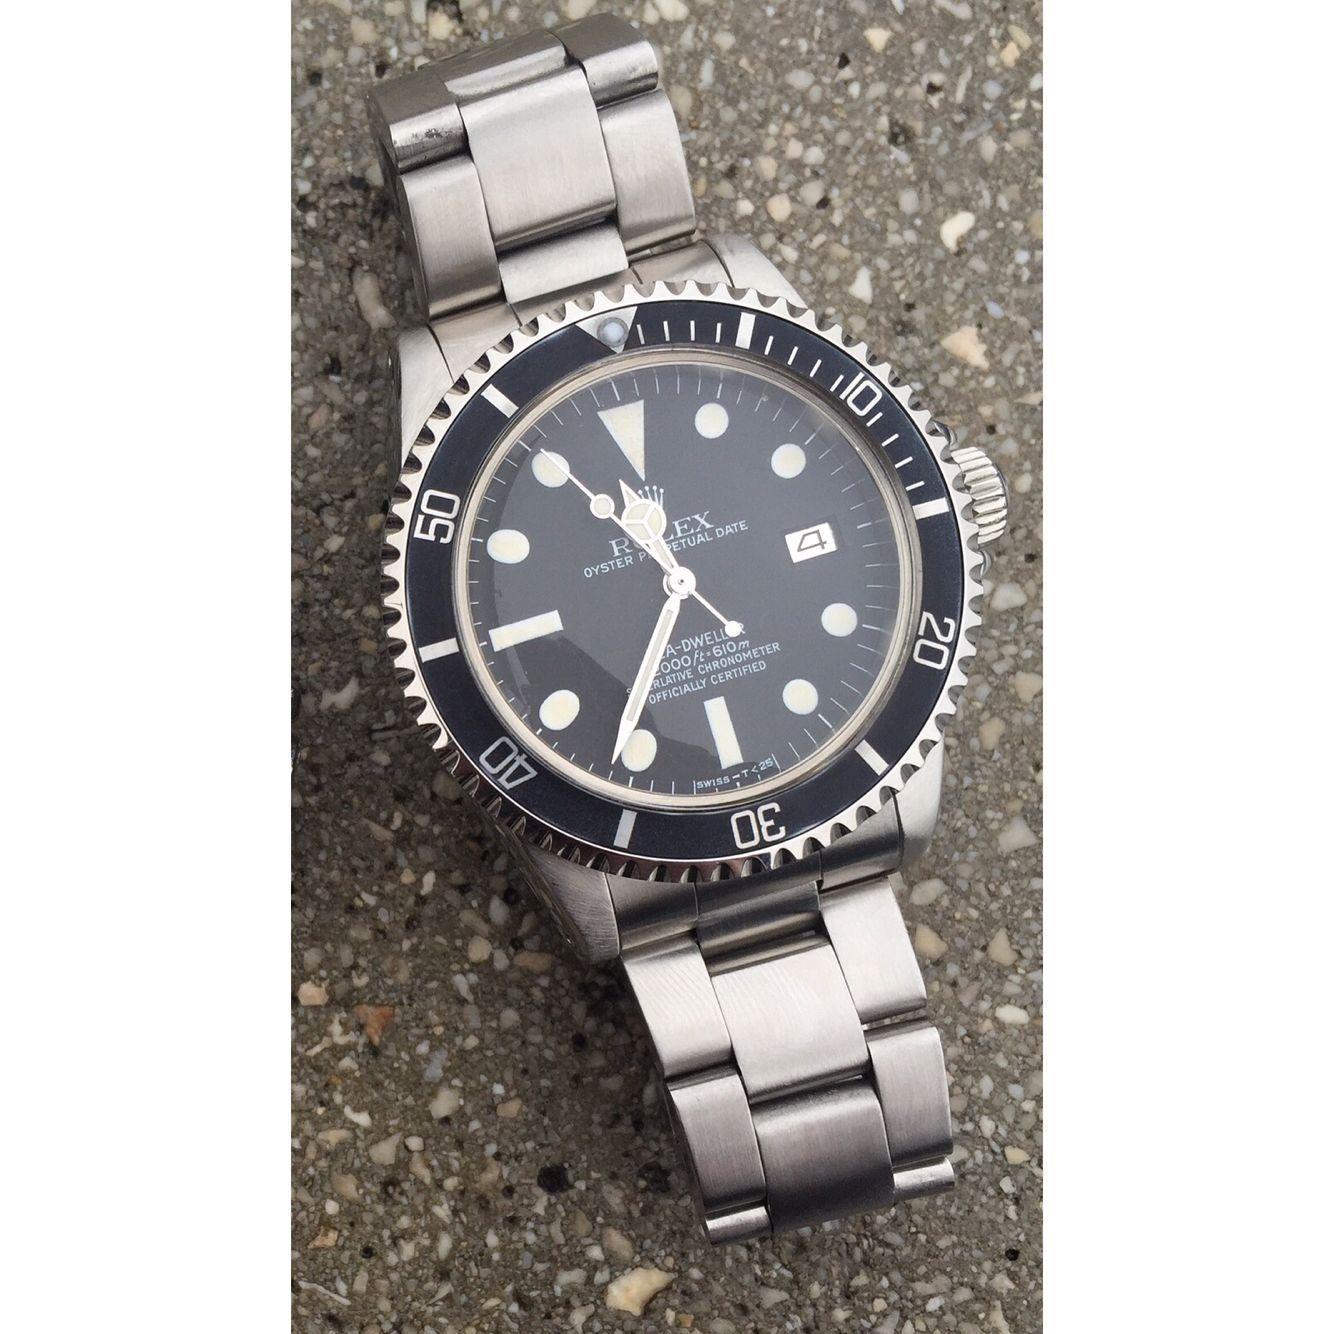 Rolex sea dweller 1665 Mk3. Per maggiori info contattare in privato⭐️⭐️#rolex #vintage #daytona #patek #audemarspiguet #datejust #datedate #chanel